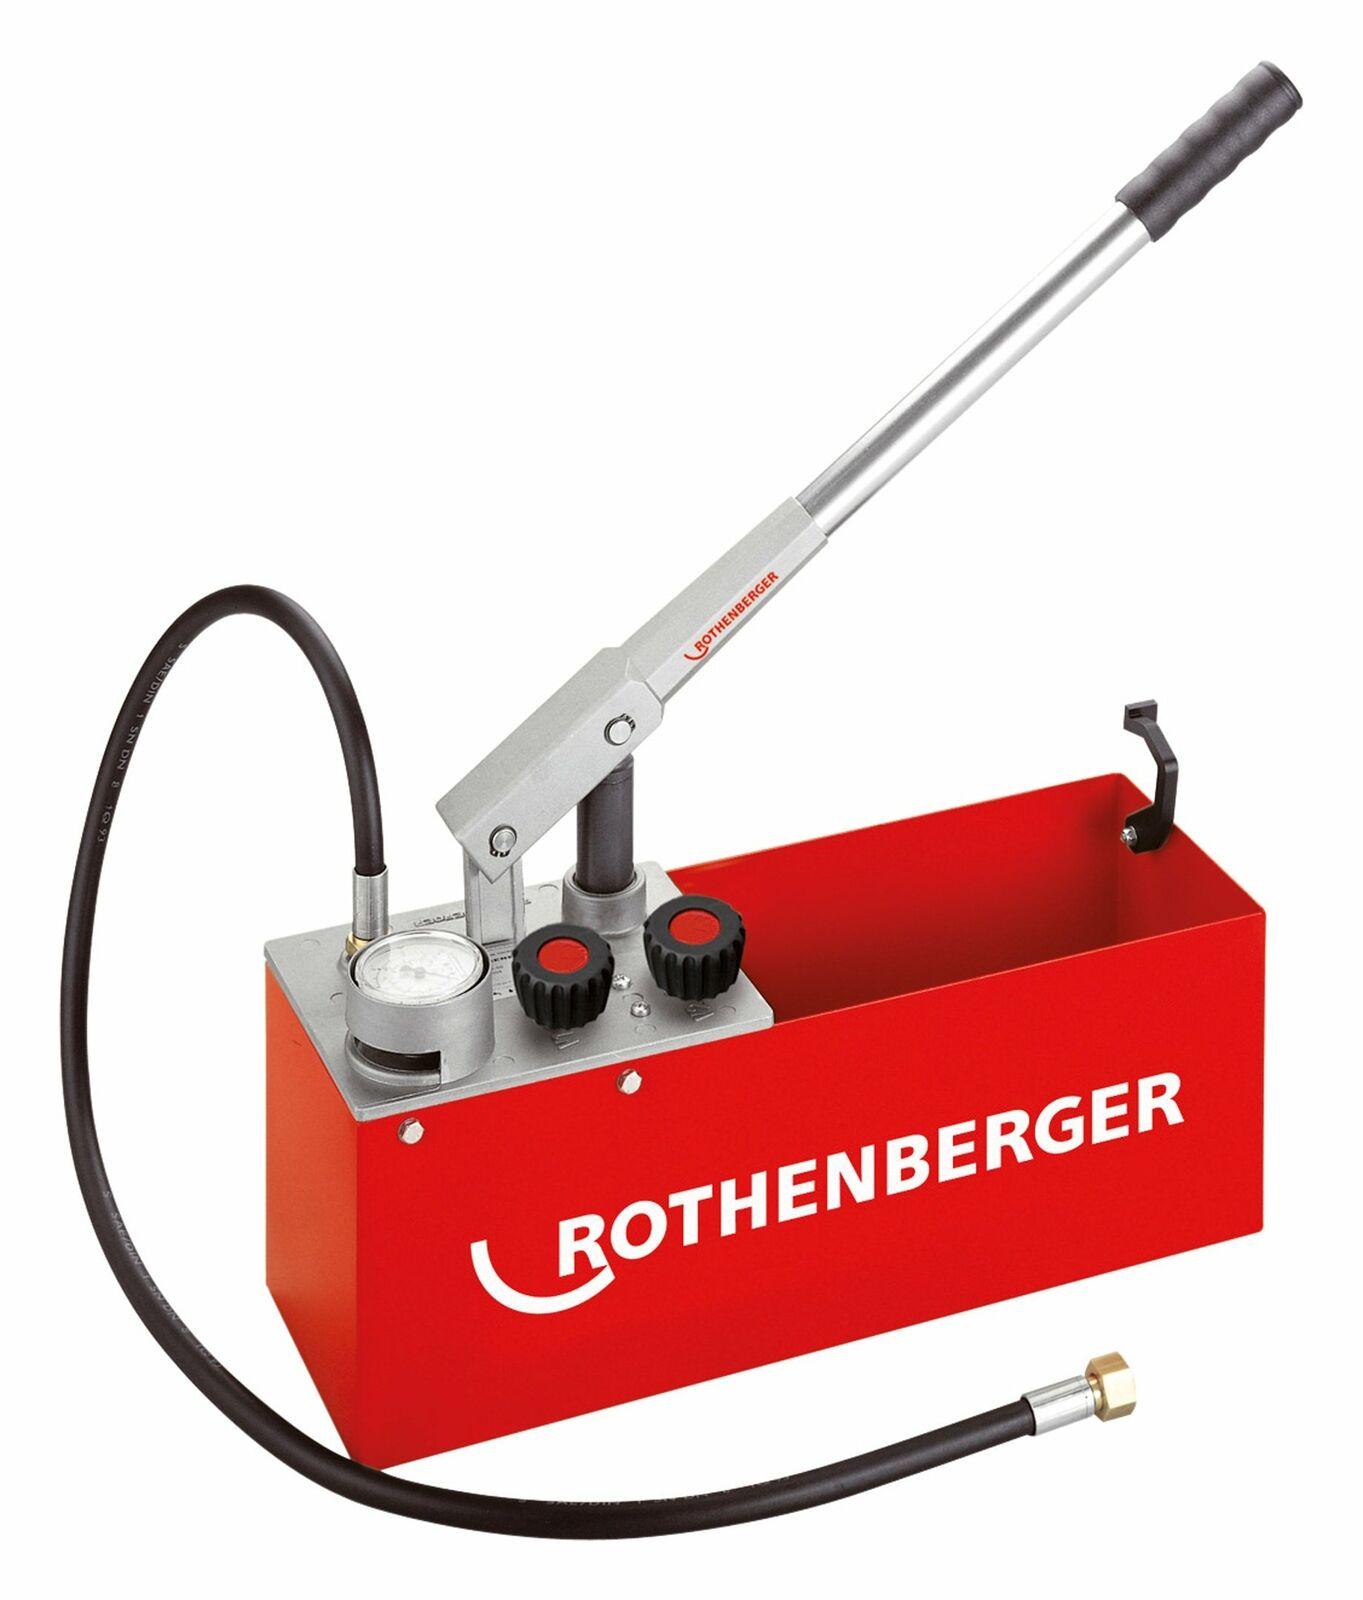 Rothenberger Prüfpumpe RP50-S - 6.0200